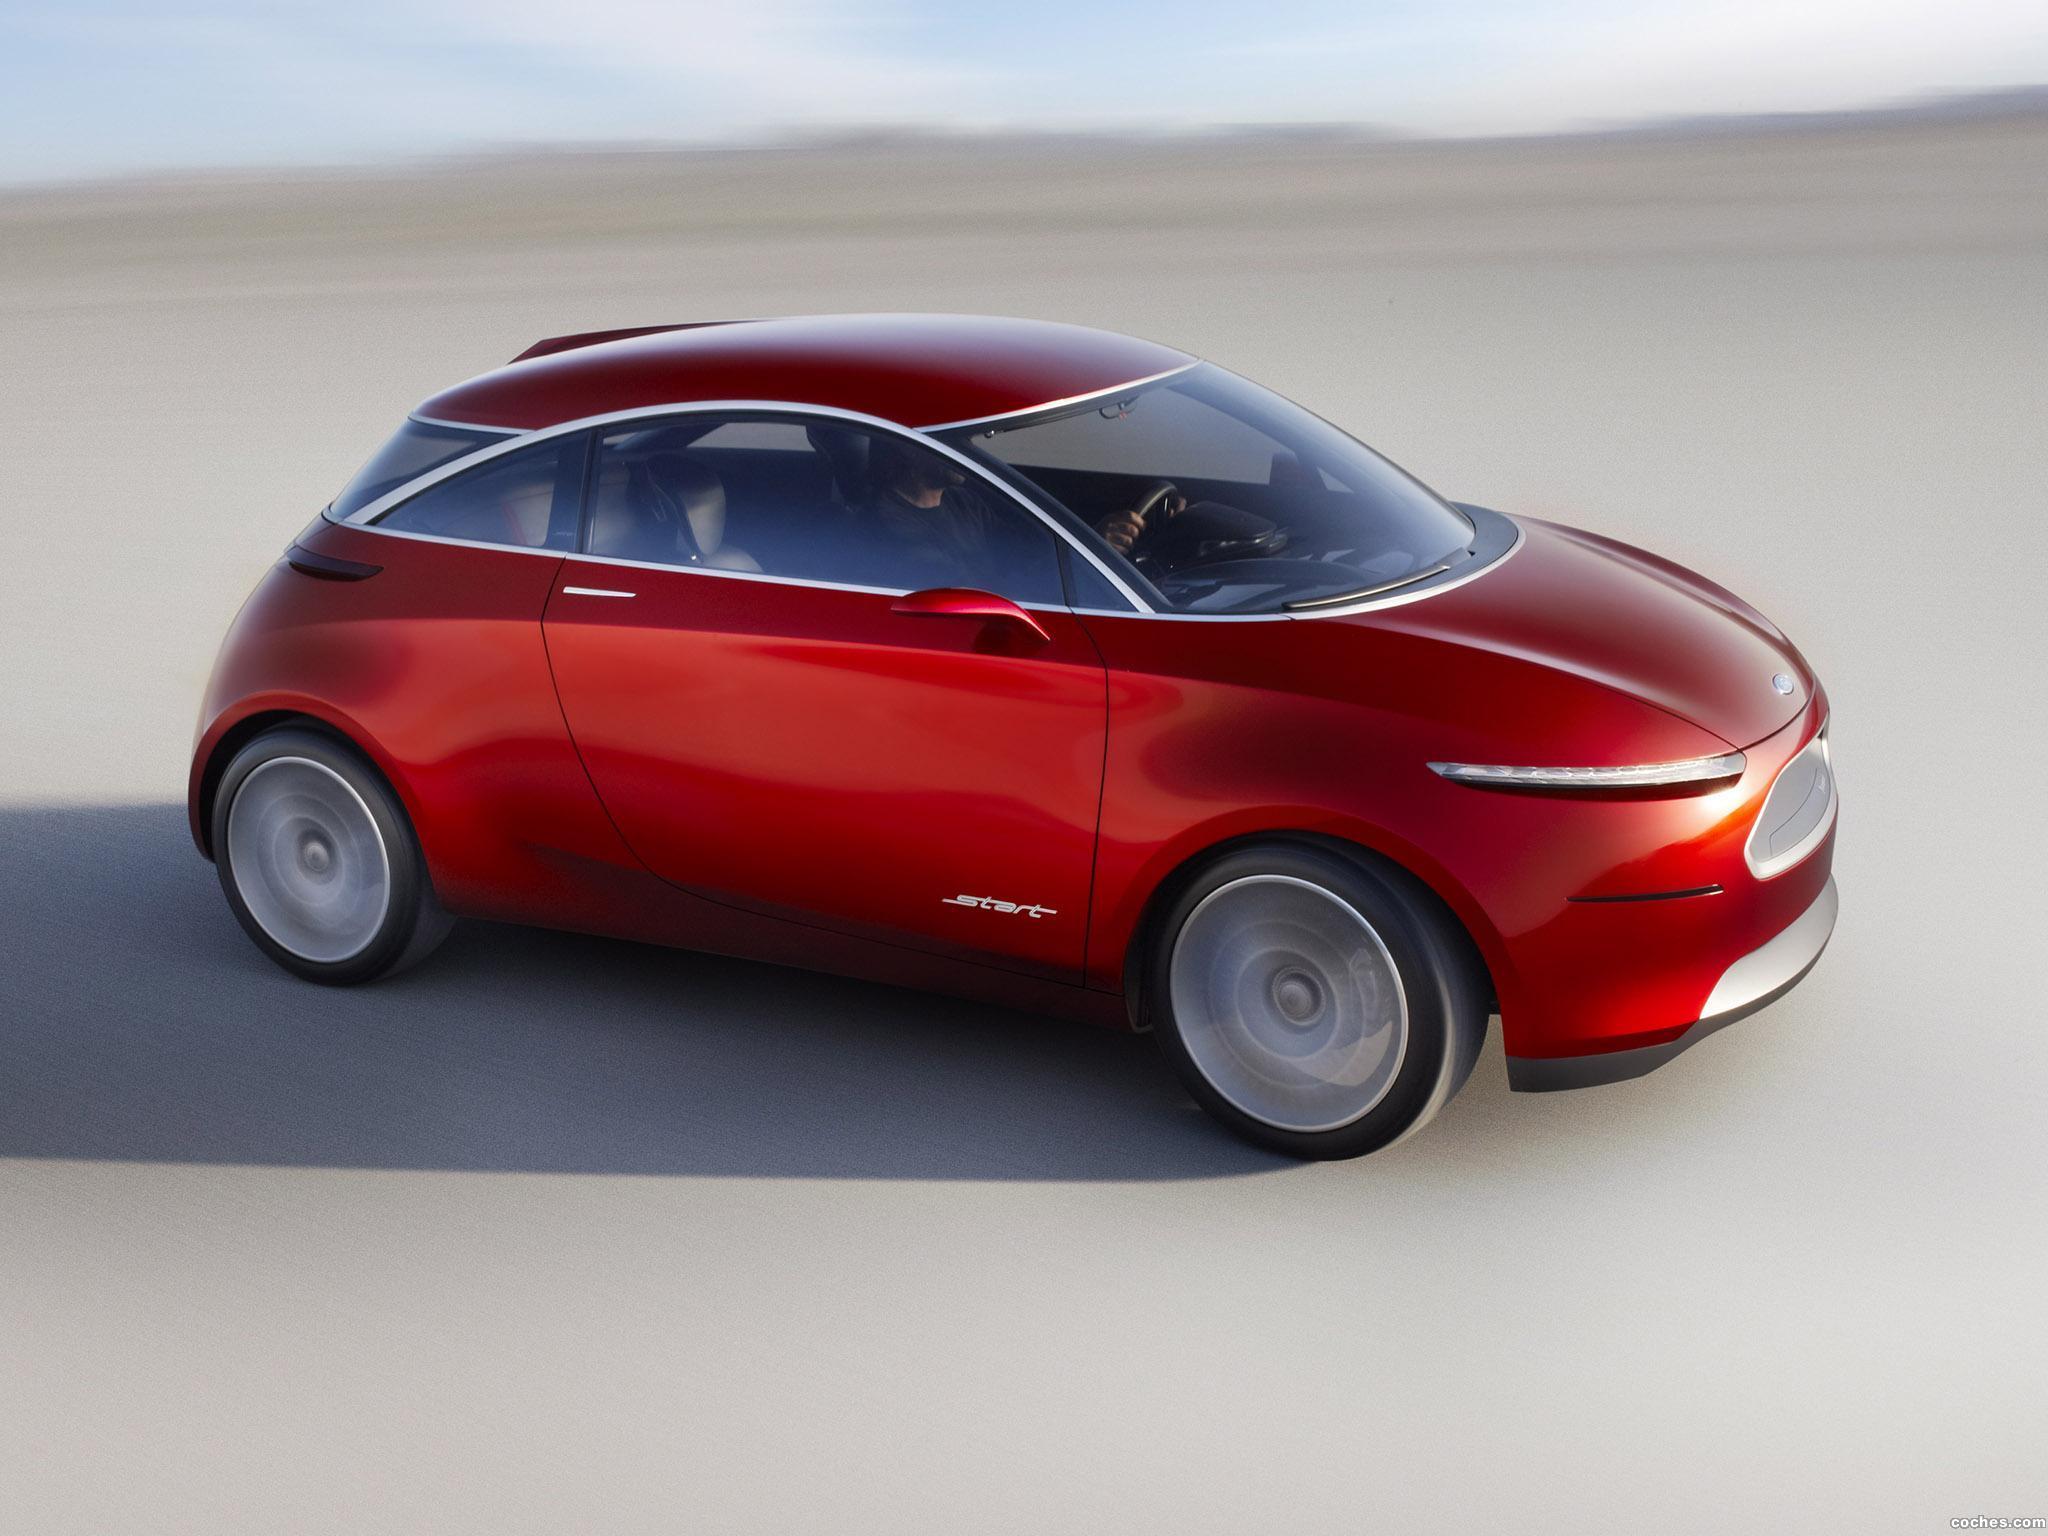 Foto 0 de Ford Start Concept 2010